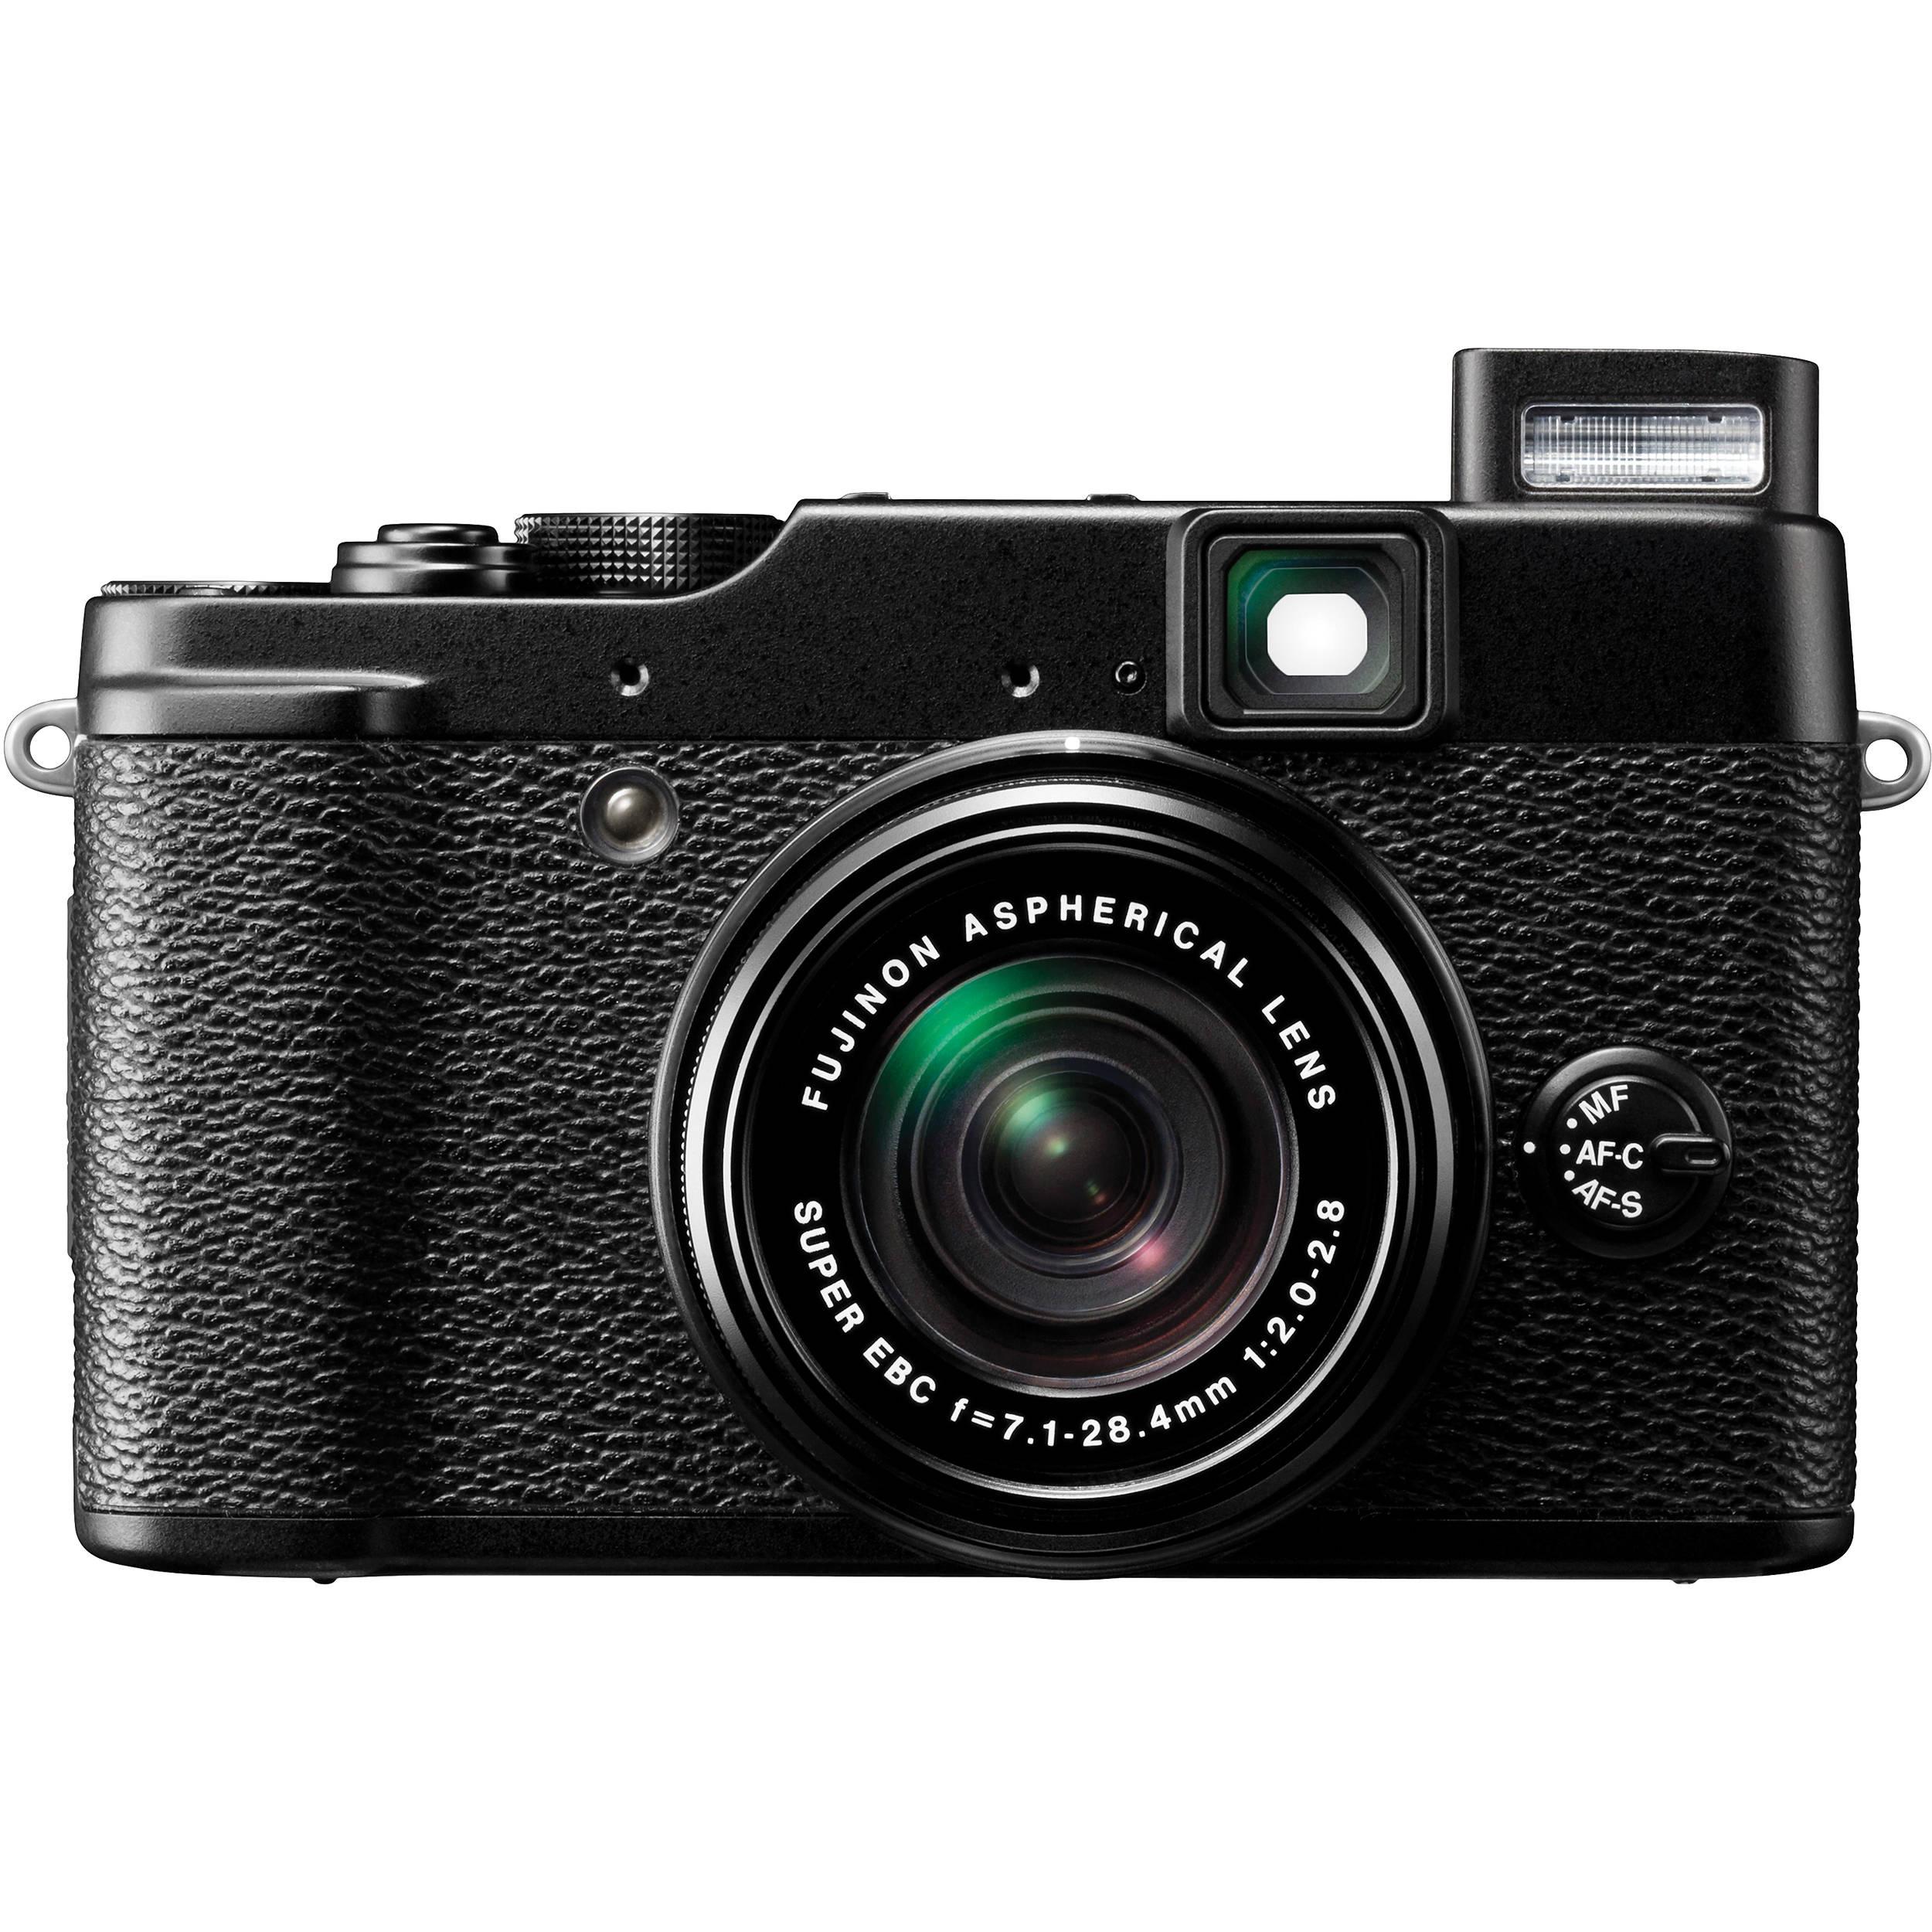 Fujifilm X10 Digital Camera (Black) 16190089 B&H Photo Video